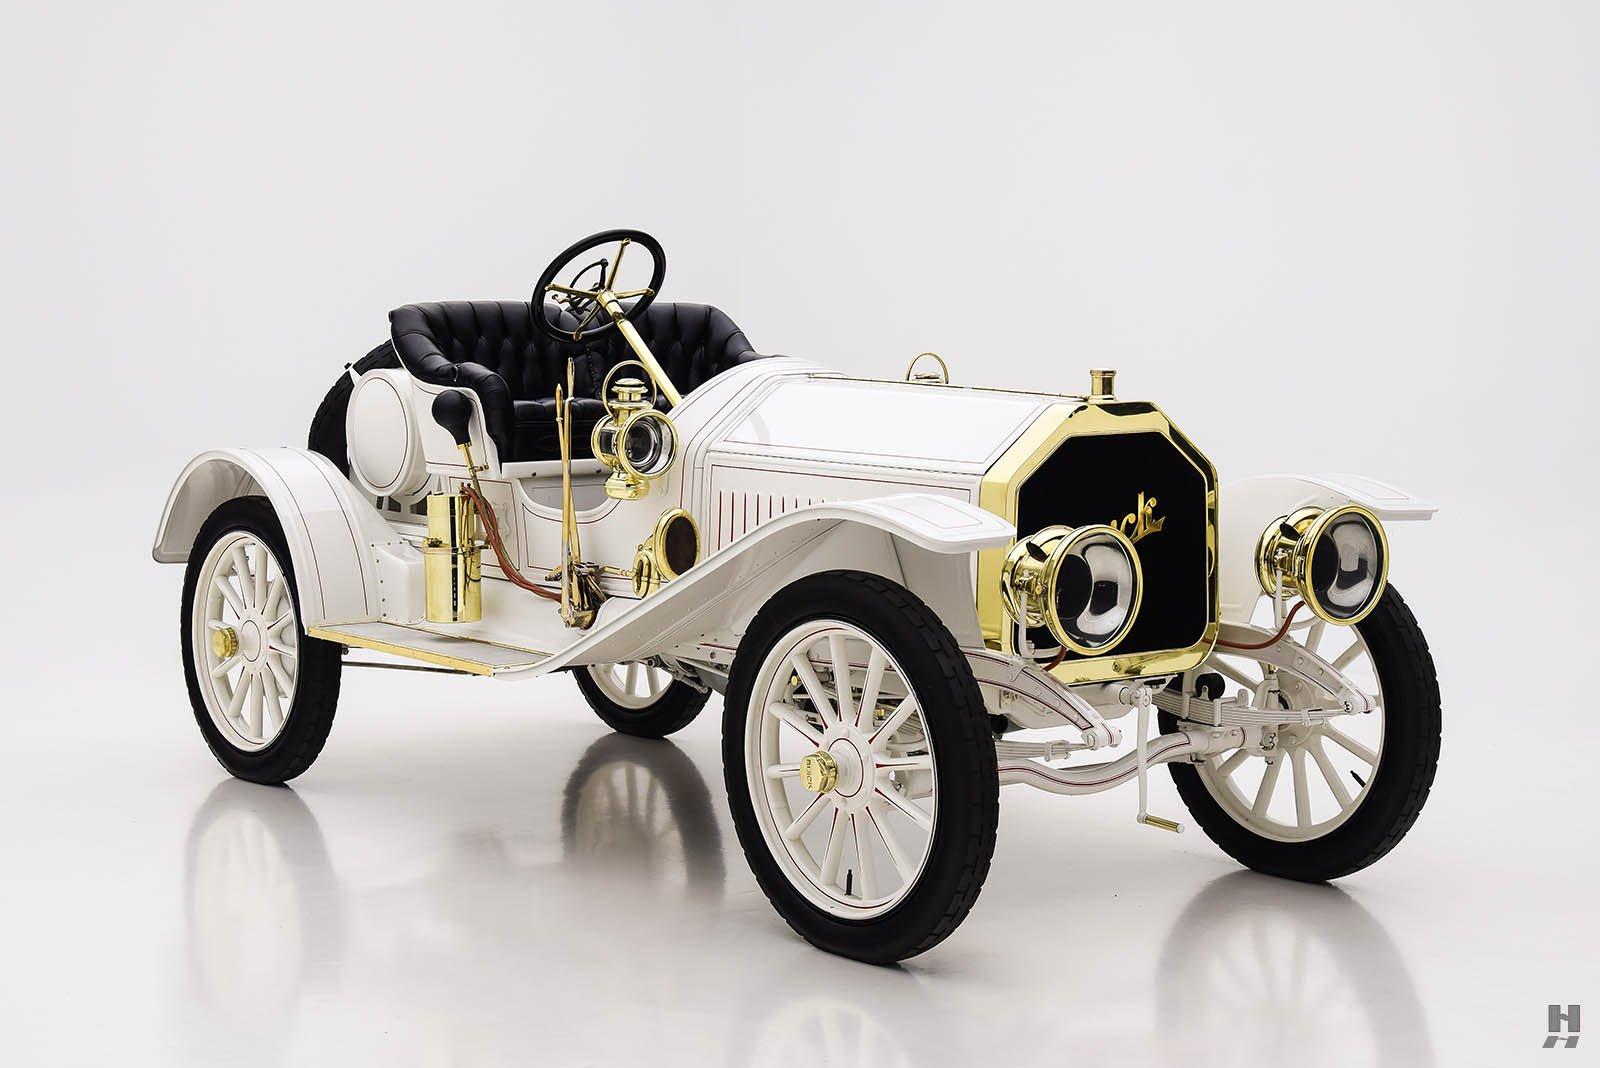 1910 Model 16 Buick - Buick - Pre War - Antique Automobile Club of ...